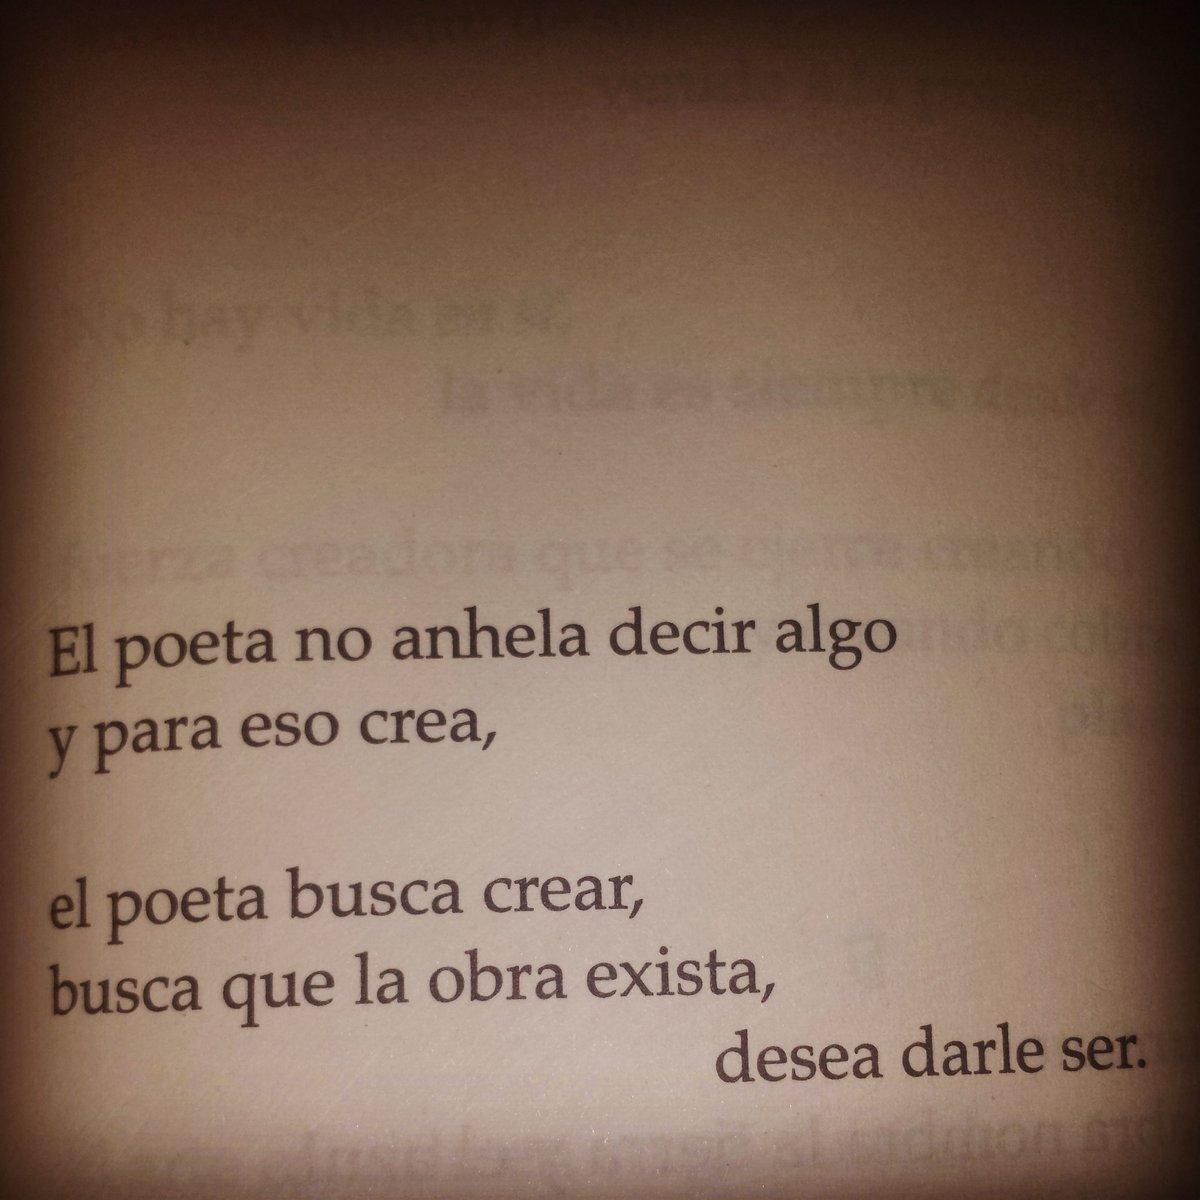 El Poeta Bohemio On Twitter Poemas Poesia Frases Sentimientos